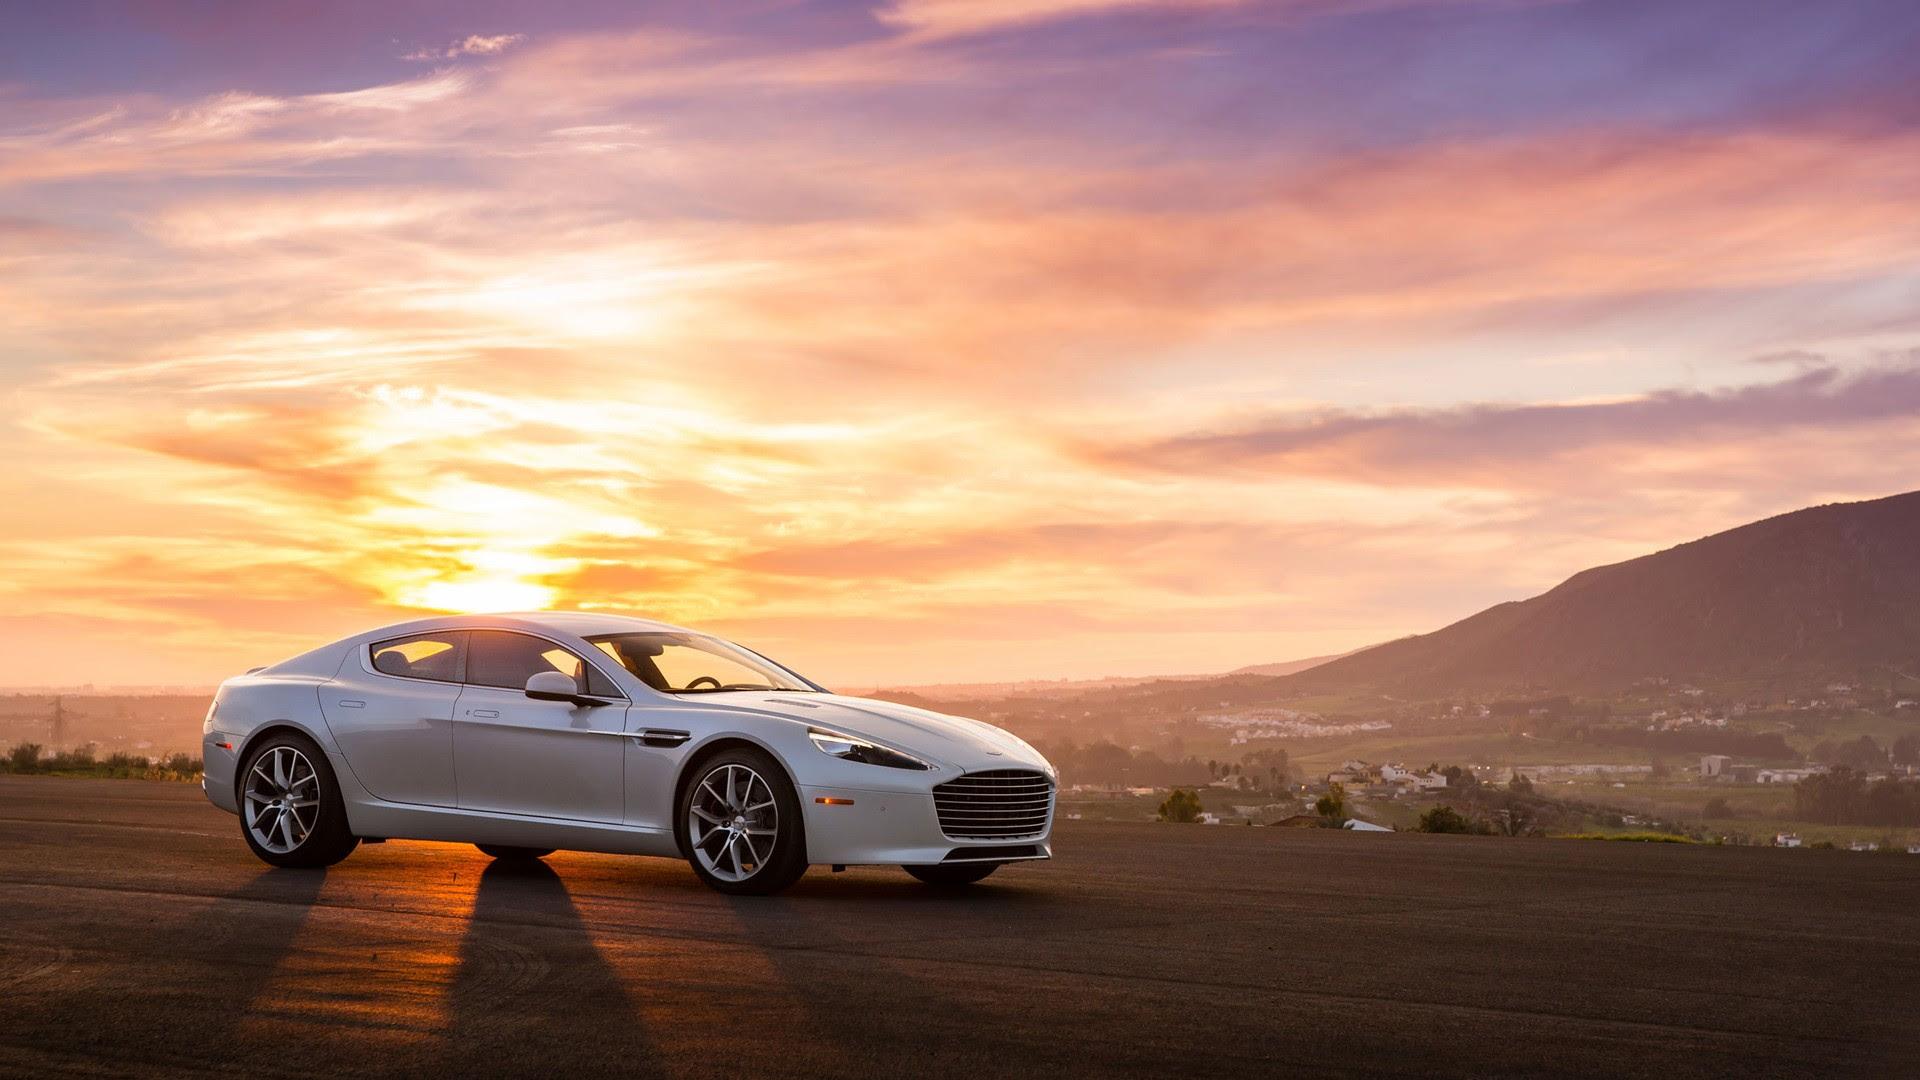 2014 Aston Martin Ra